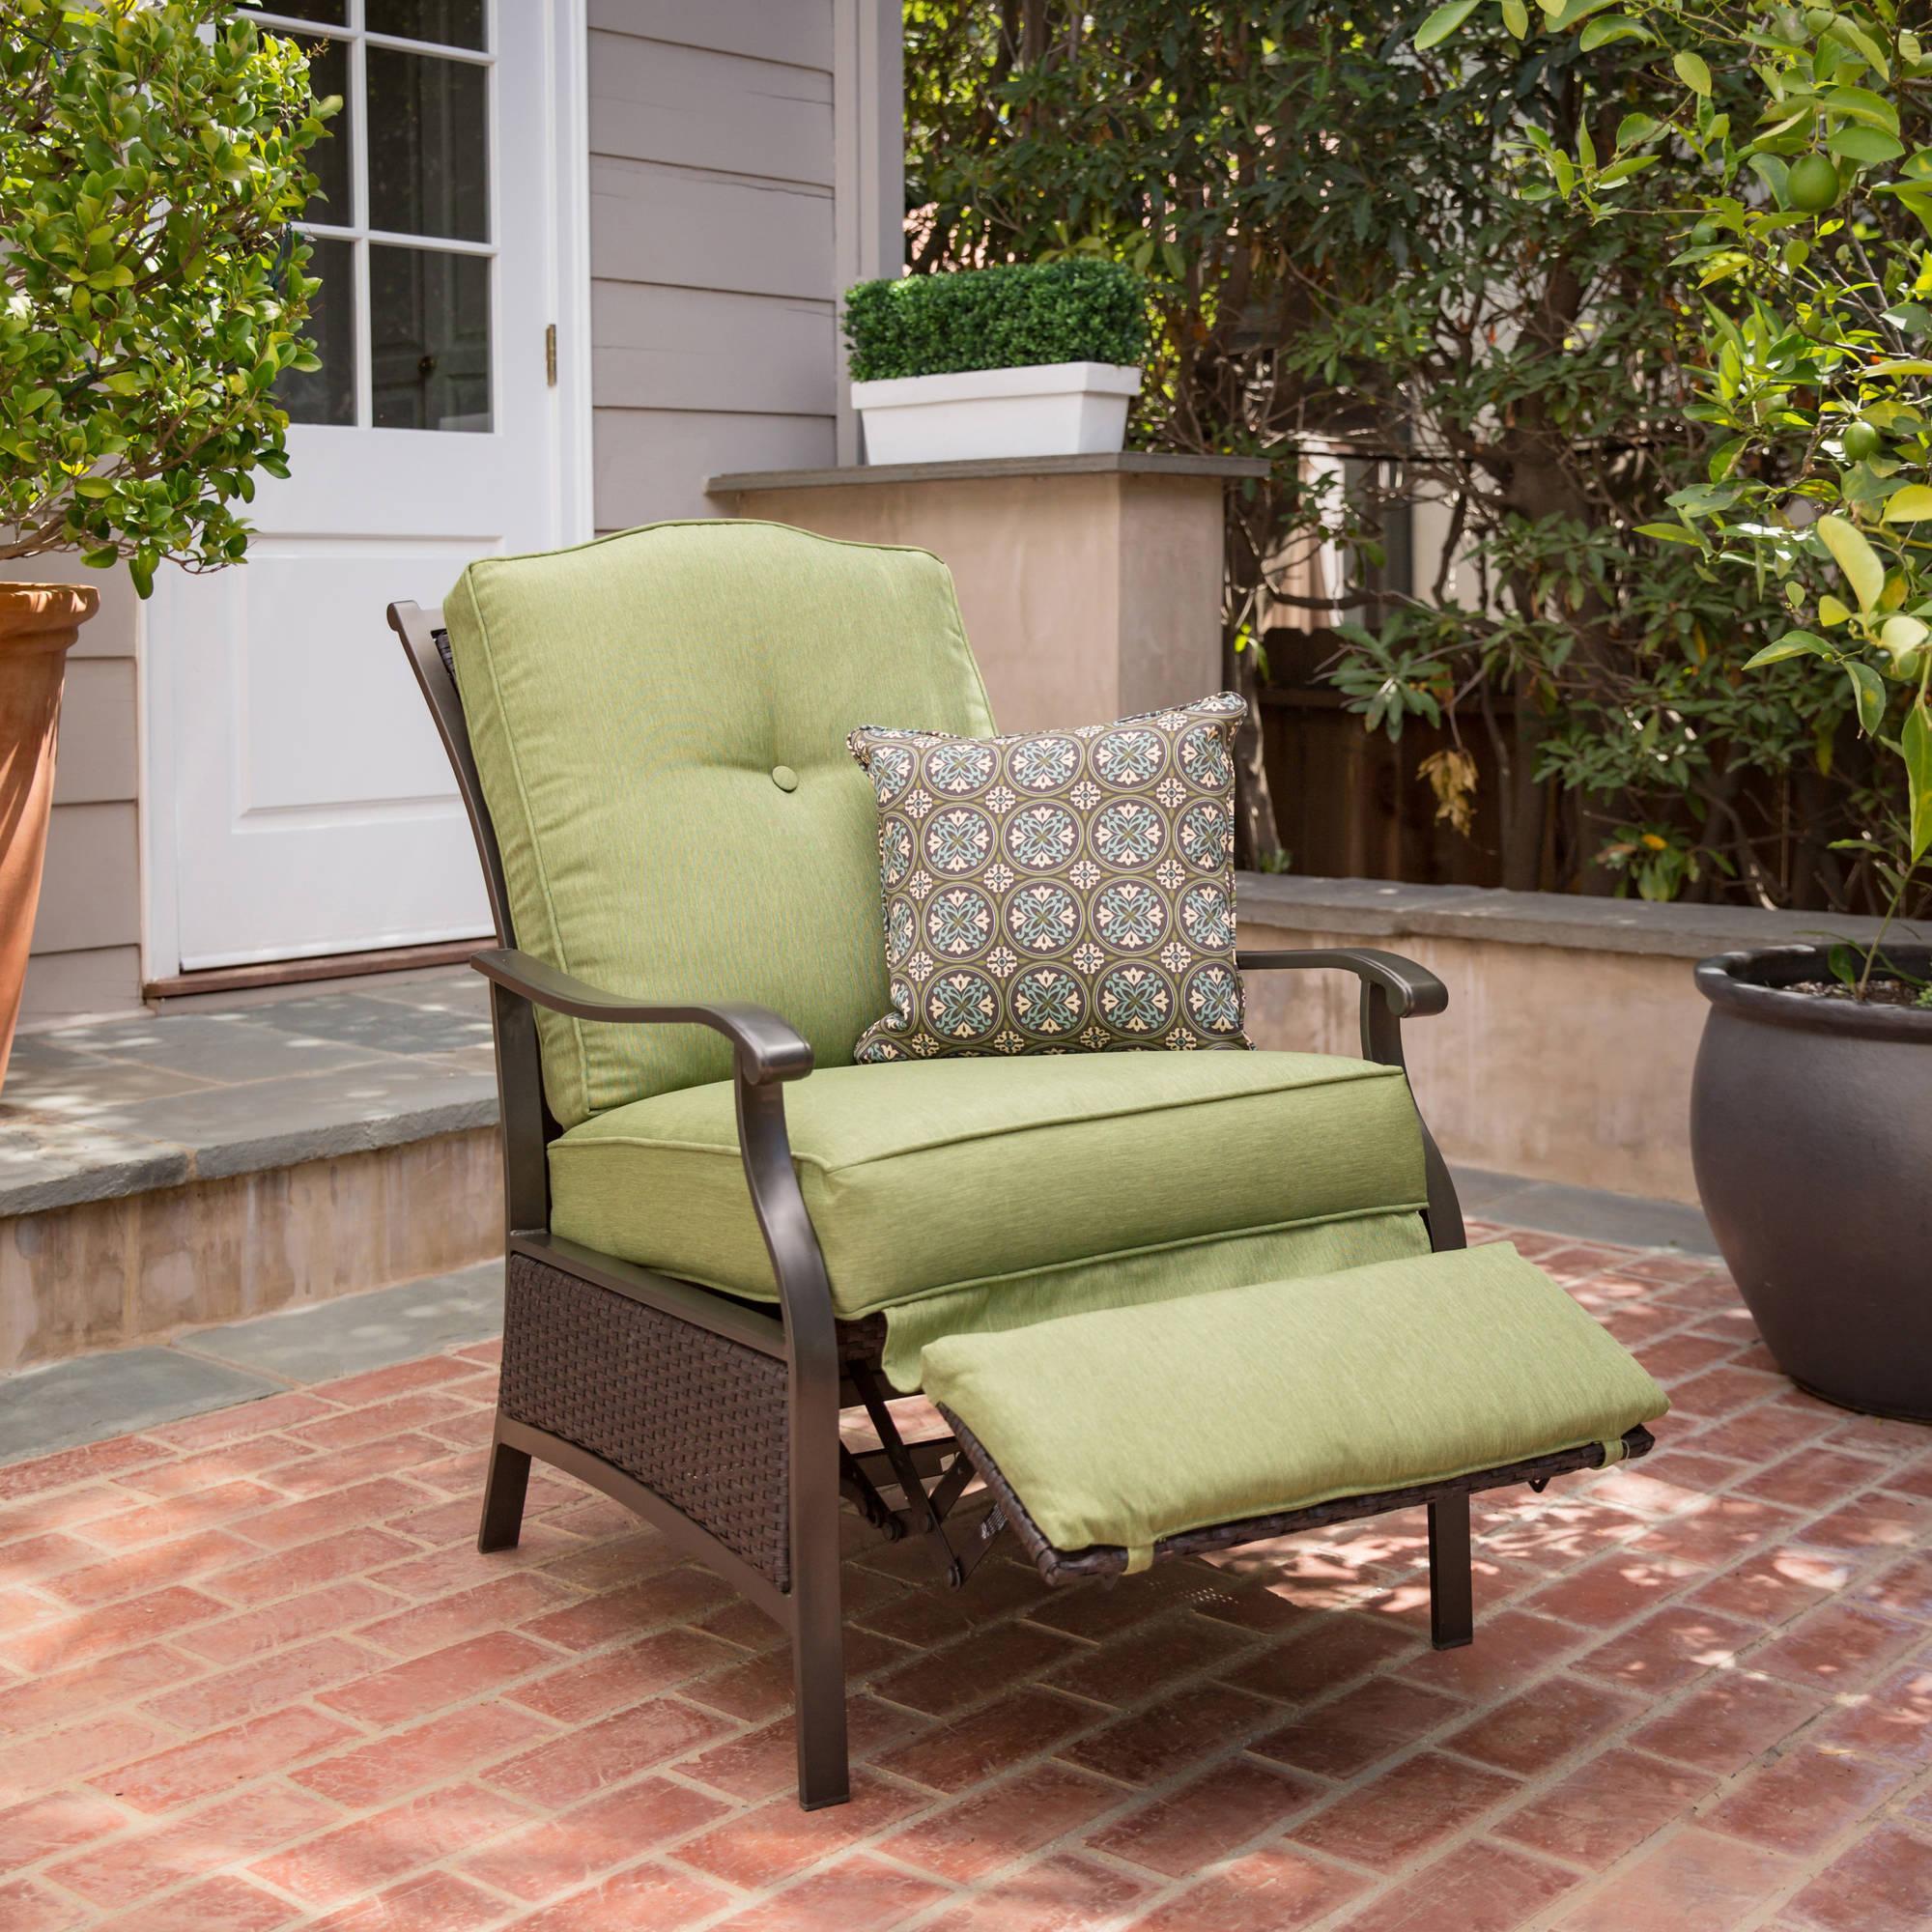 porch furniture patio furniture - walmart.com XEGOUQA